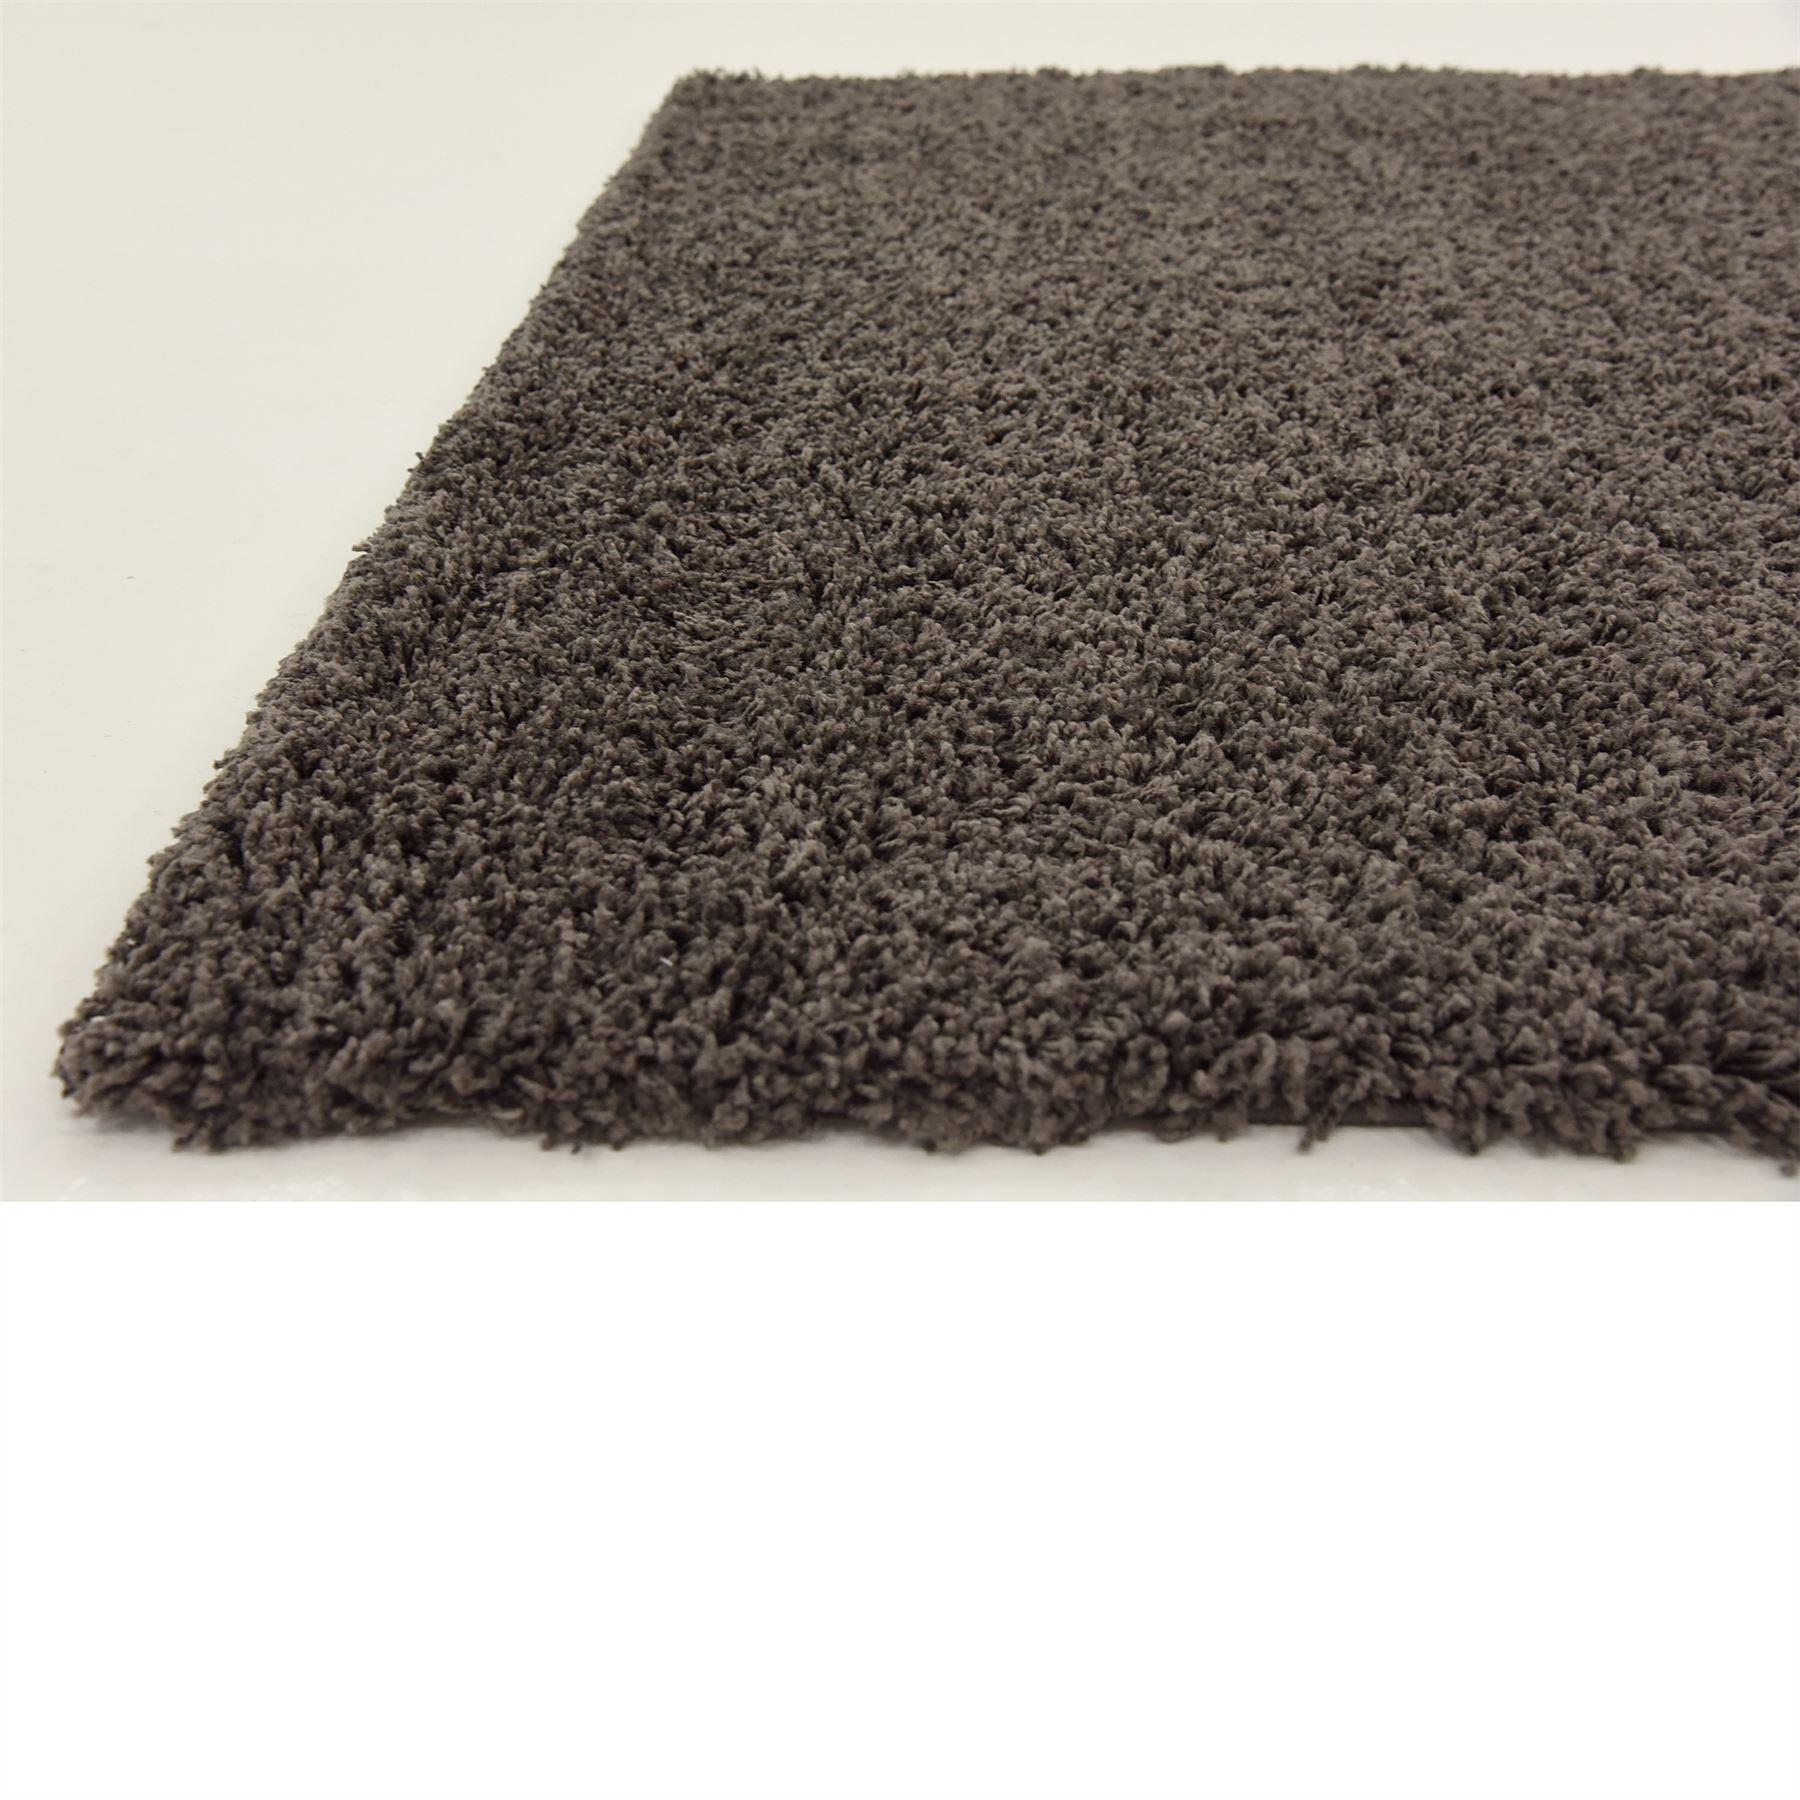 Contemporary Shag Area Rugs modern large shag area rug contemporary small carpet red soft